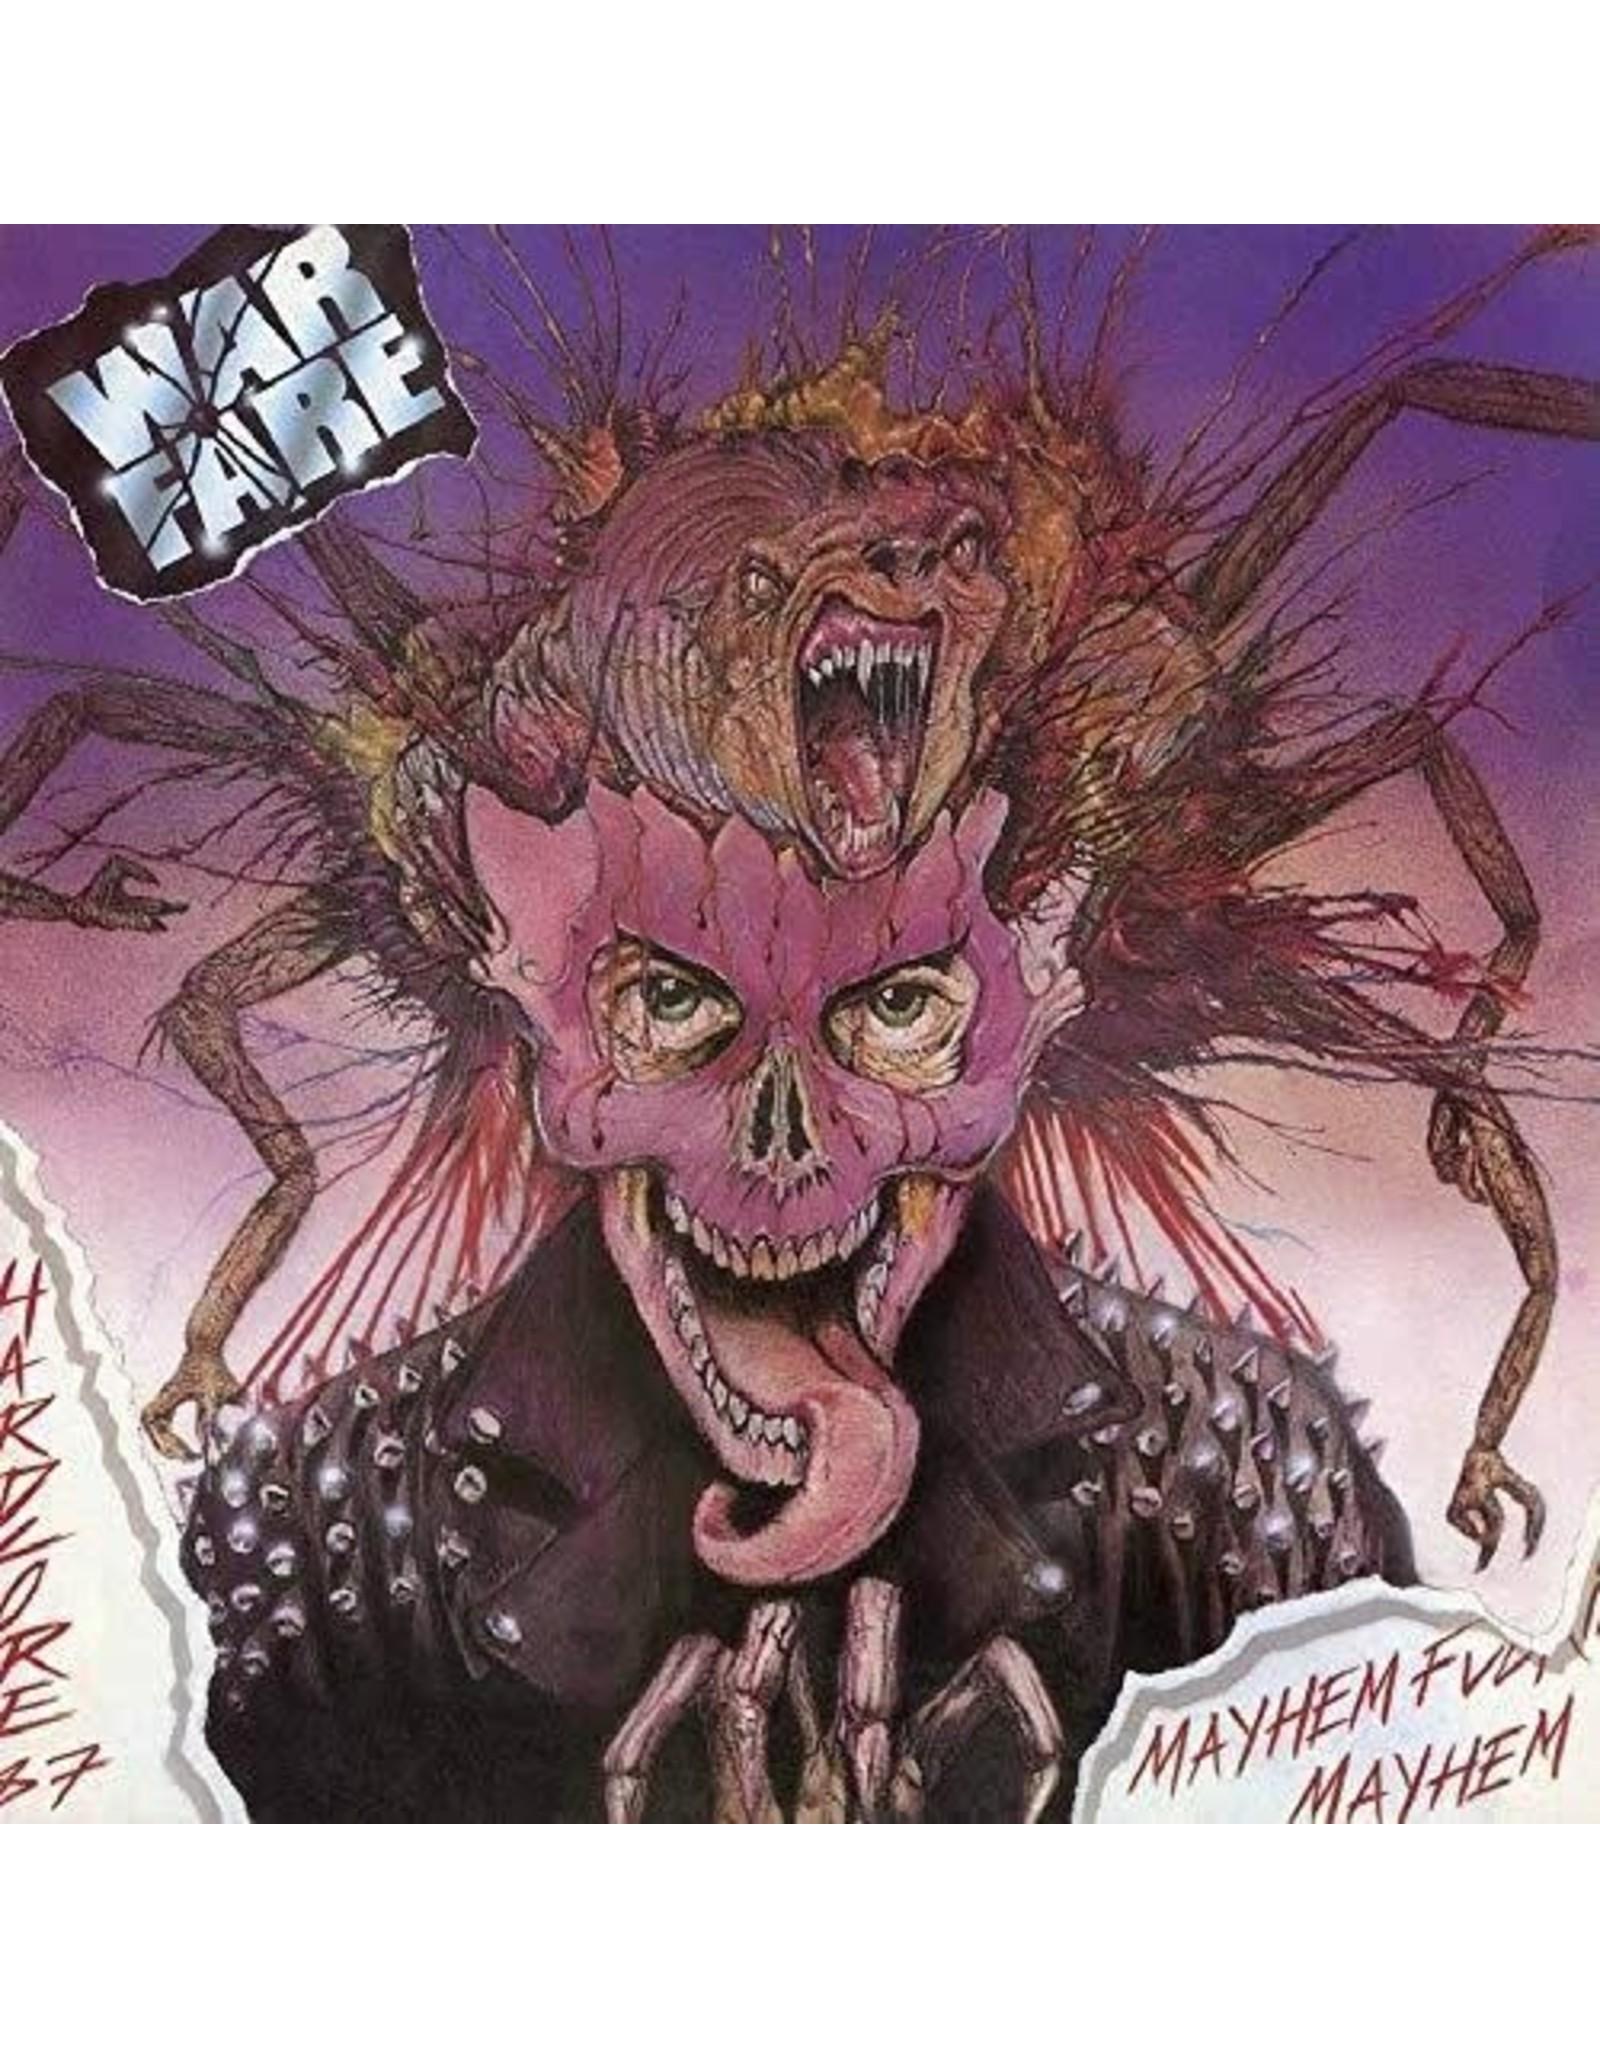 New Vinyl Warfare - Mayhem Fuckin' Mayhem LP